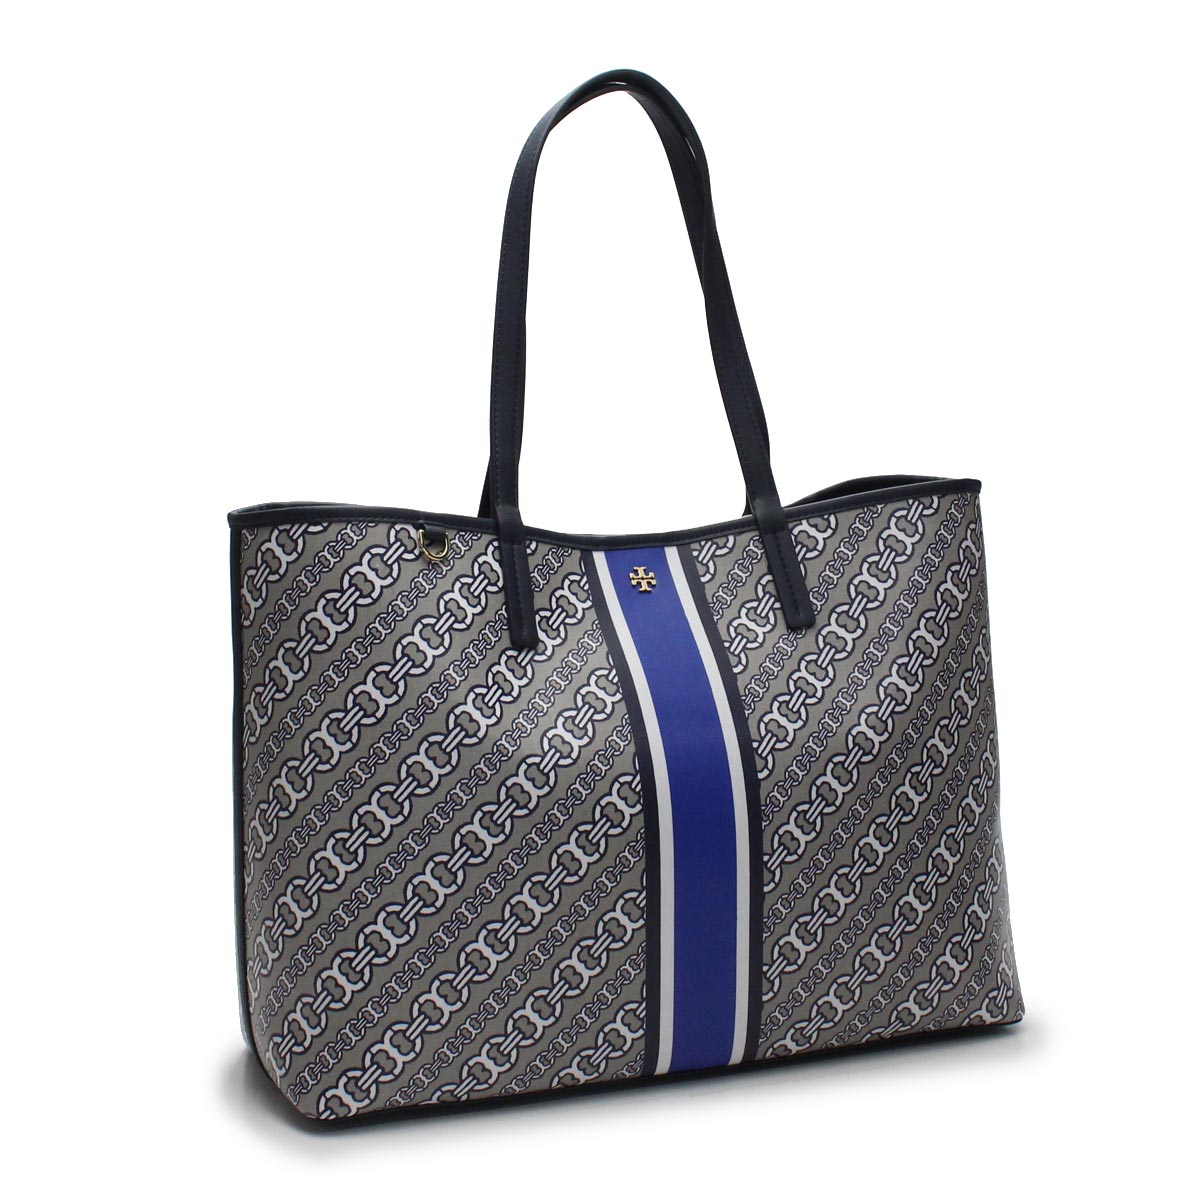 Tote bag of popular line